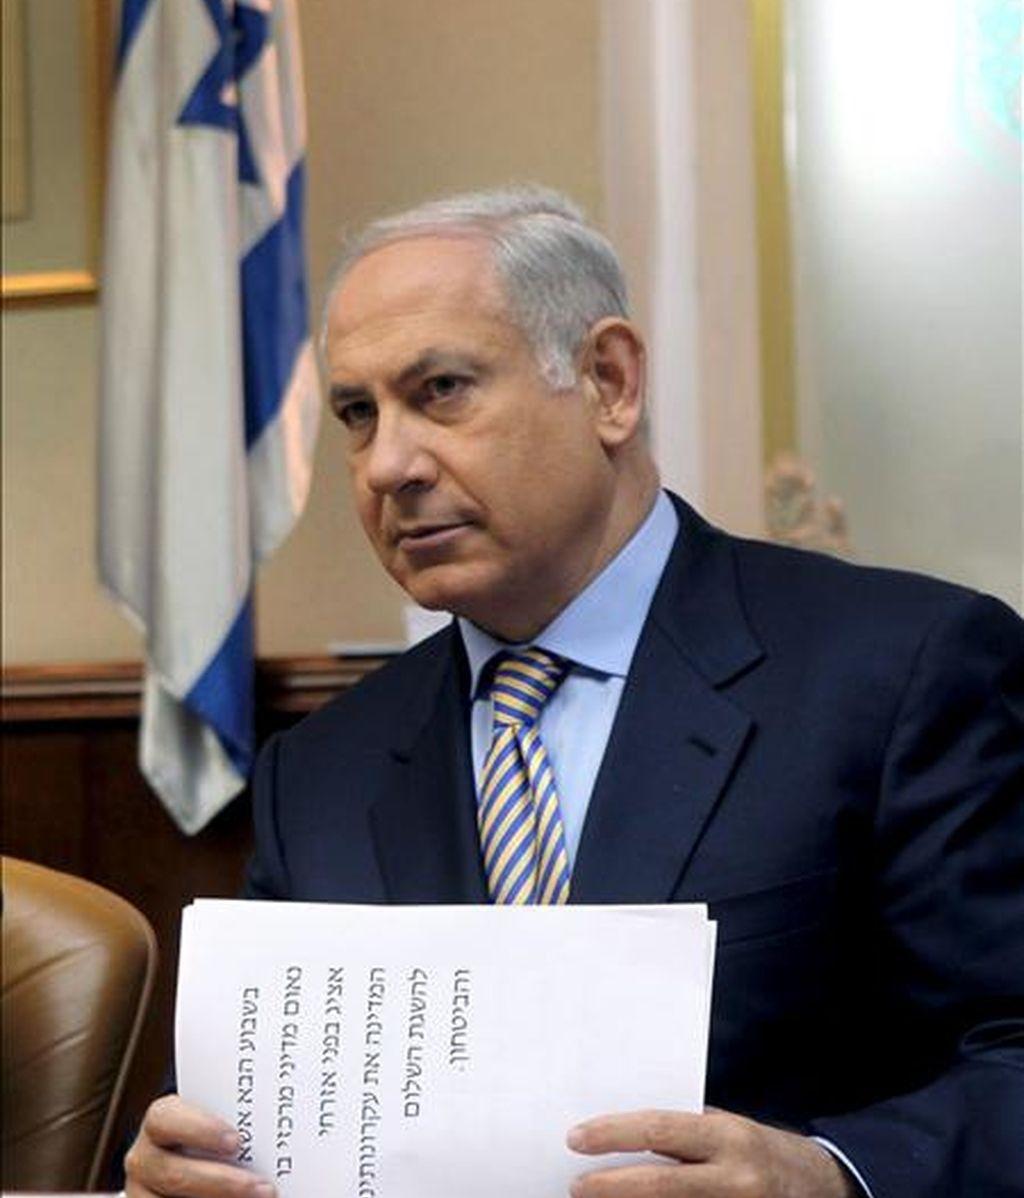 El primer ministro israelí, Benjamin Netanyahu. EFE/Archivo